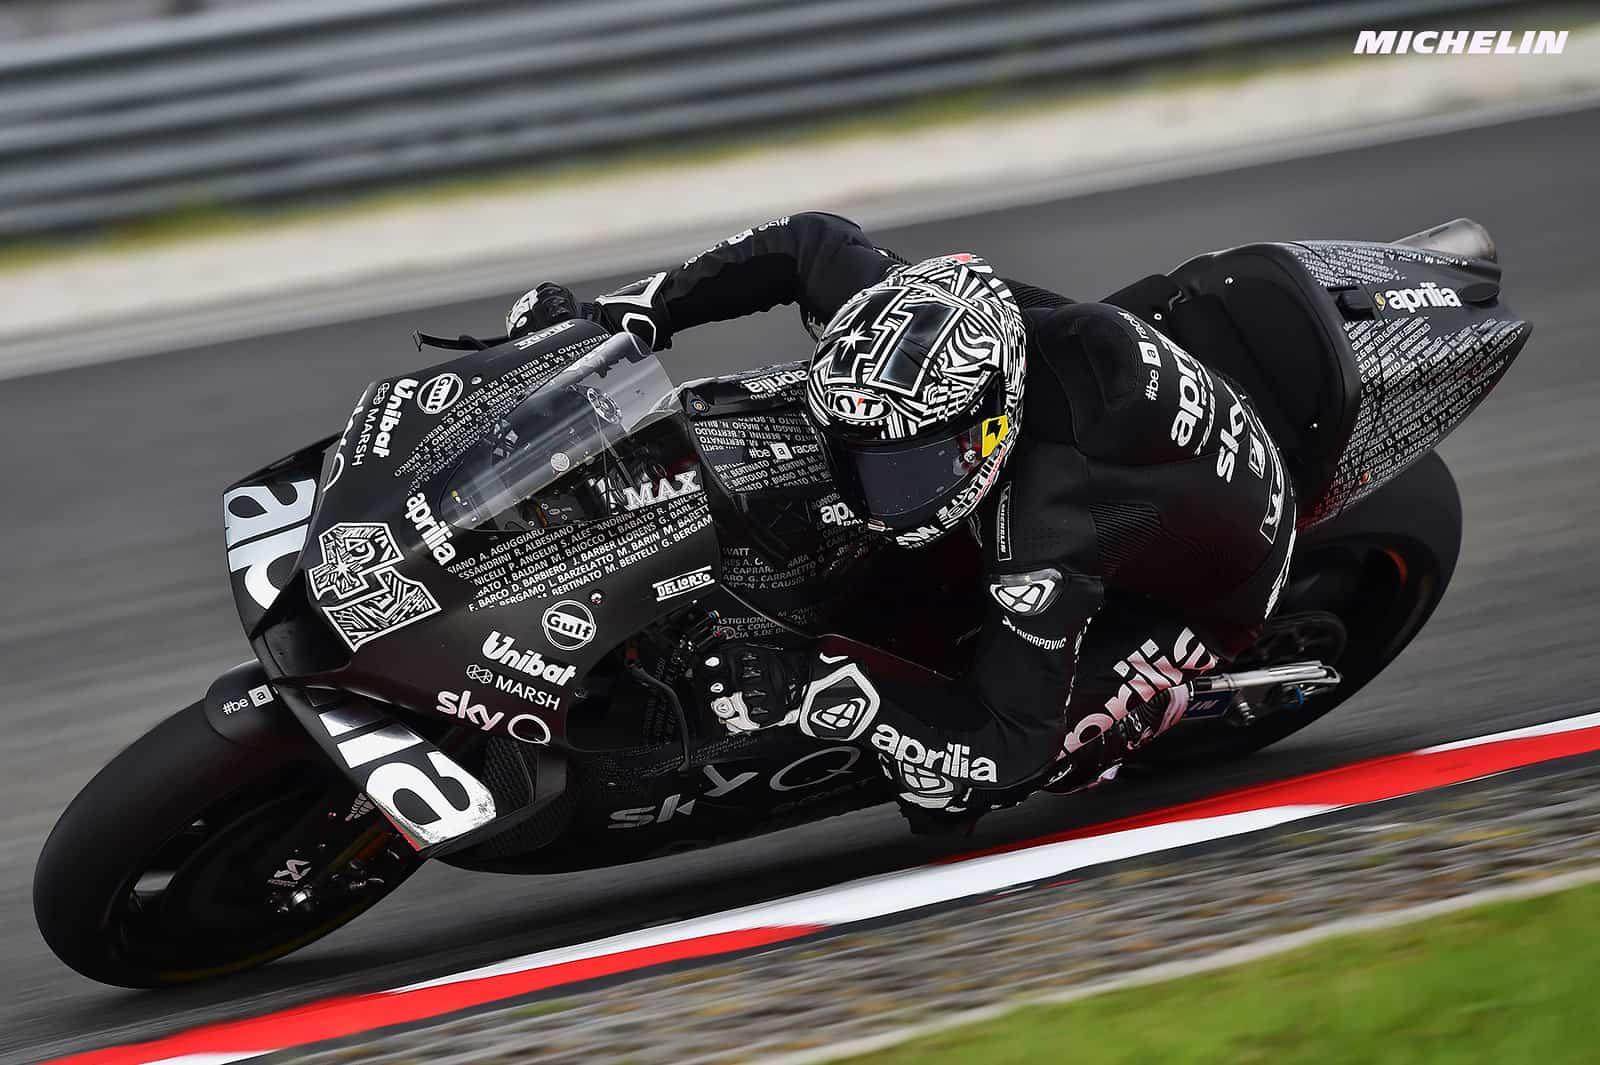 MotoGP2020 ミサノ・サーキットでのプライベートテストが終了